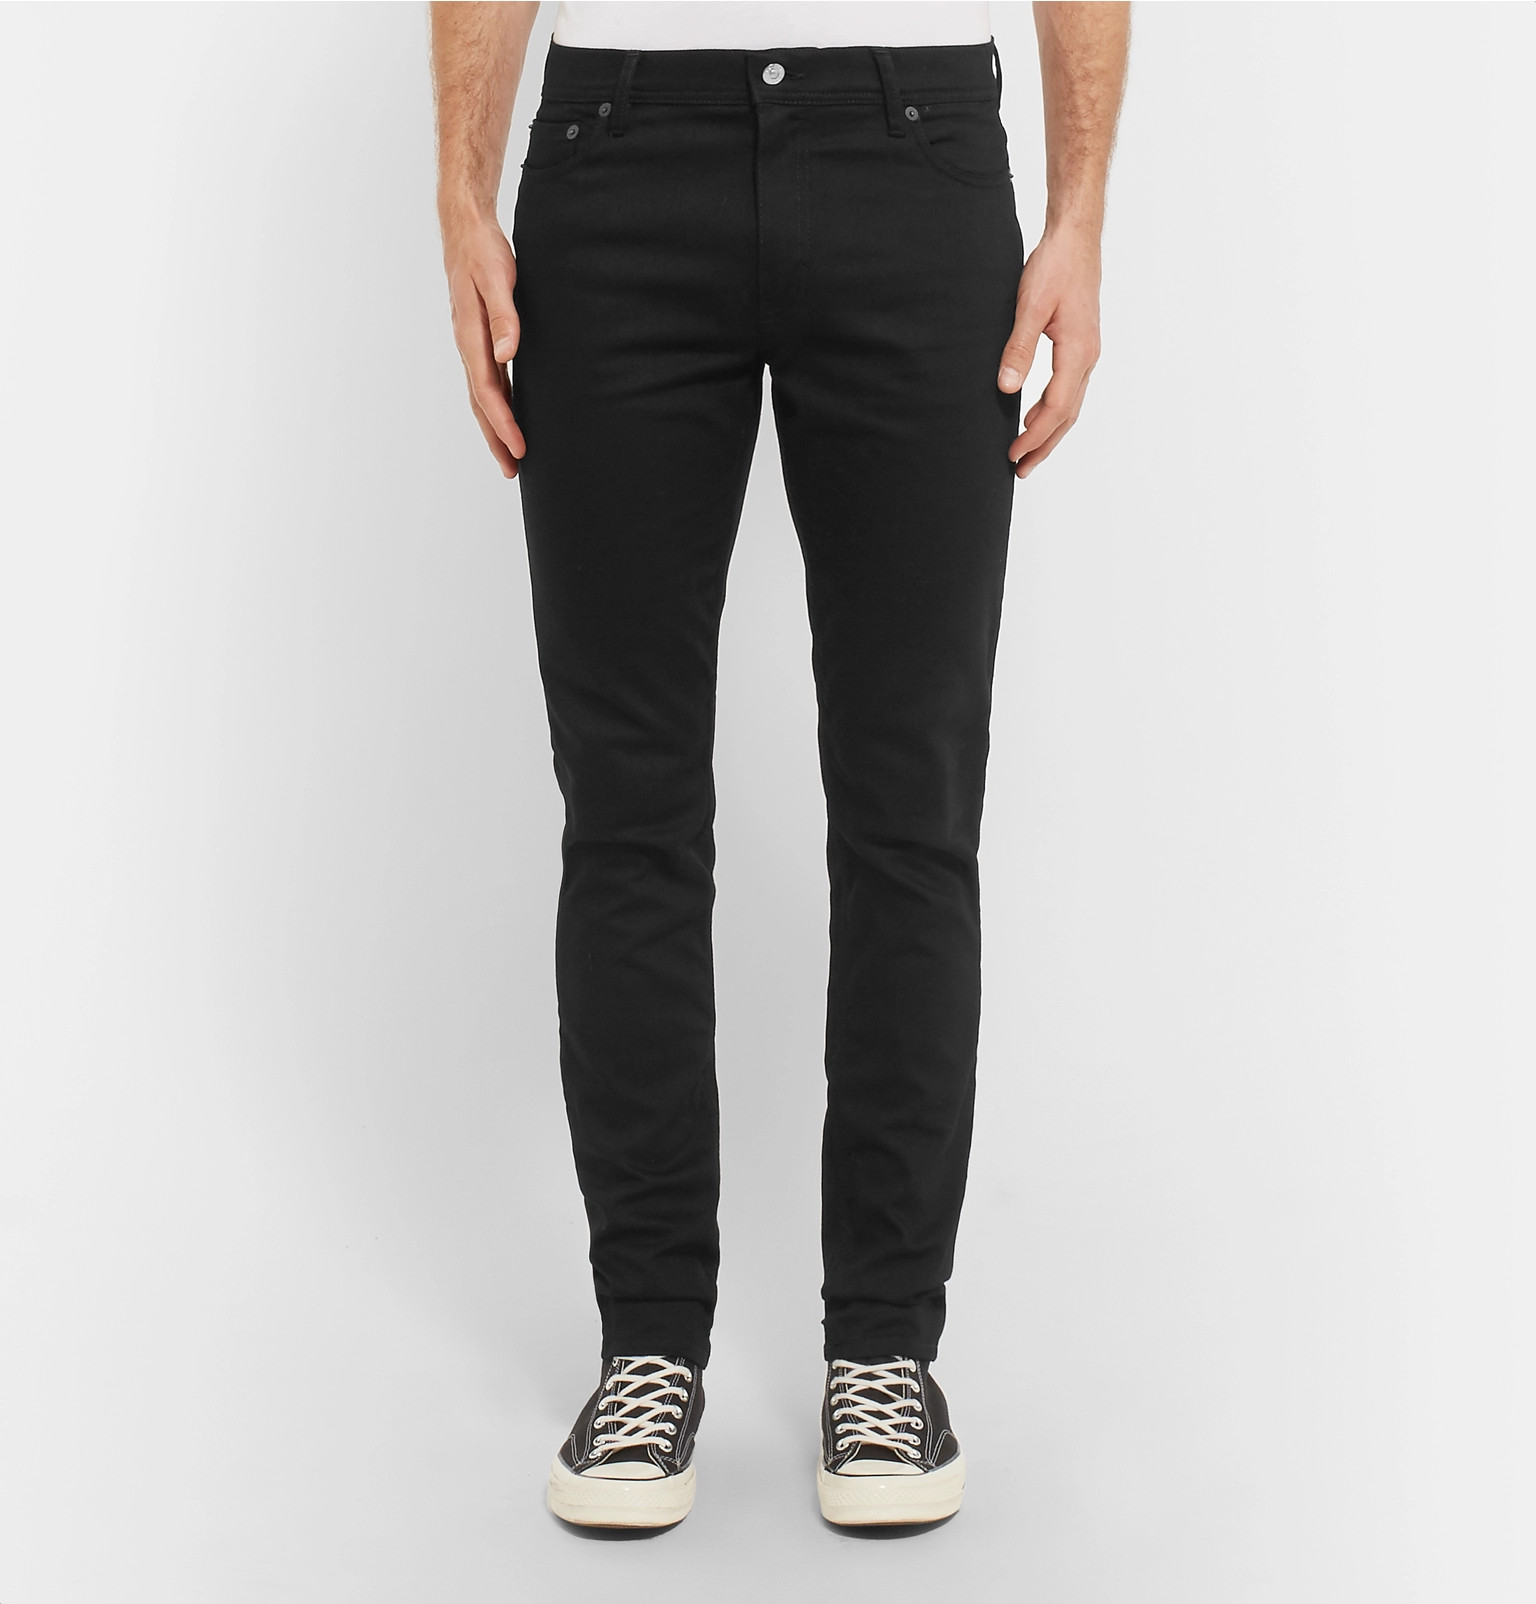 03432adf Acne Studios - North Slim-Fit Denim Jeans